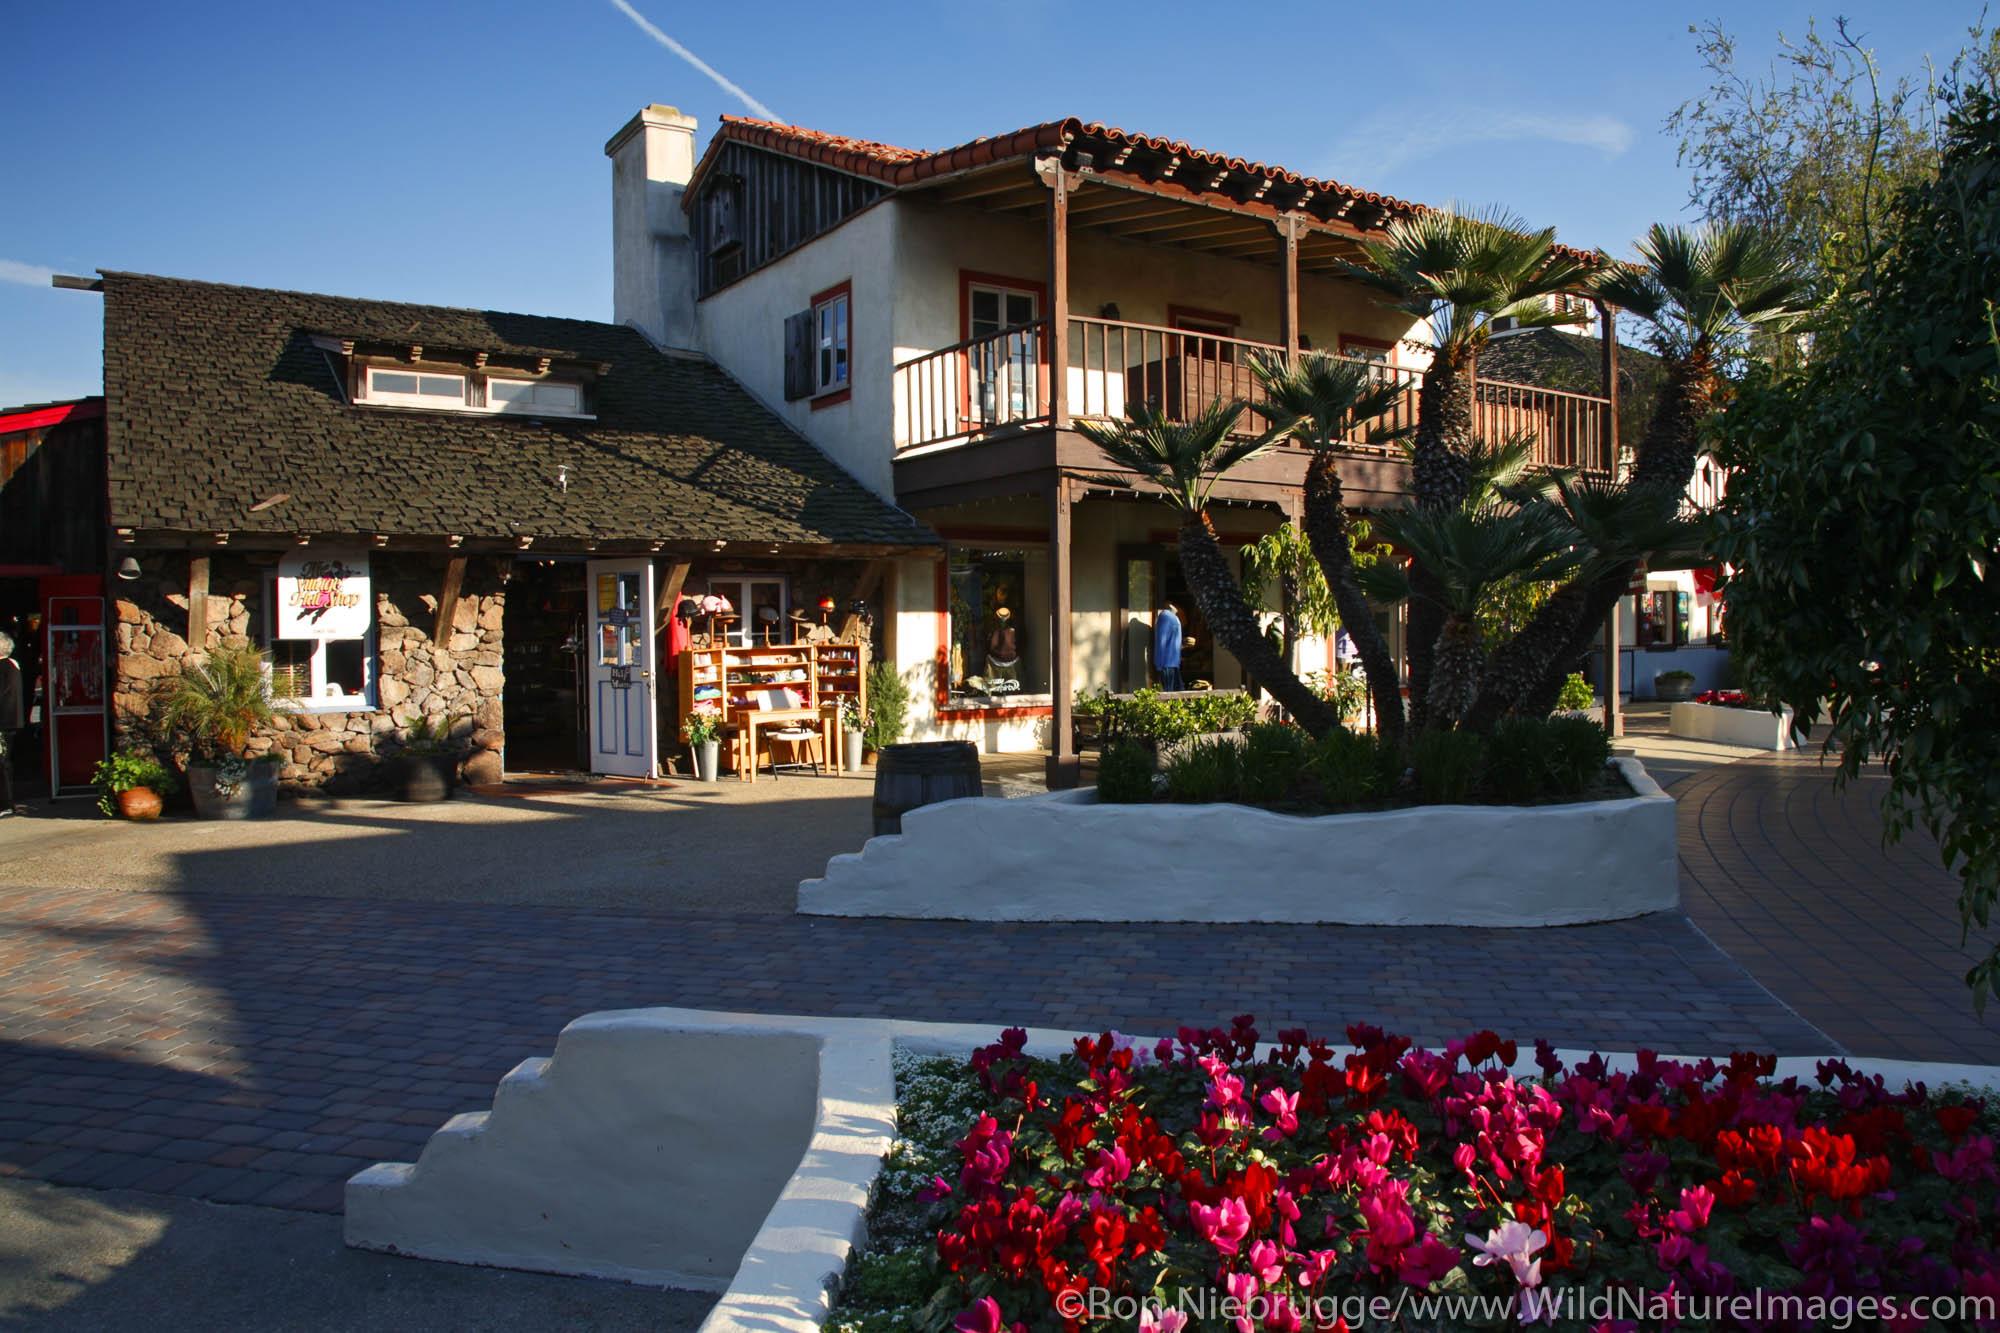 Seaport Village, San Diego, California.